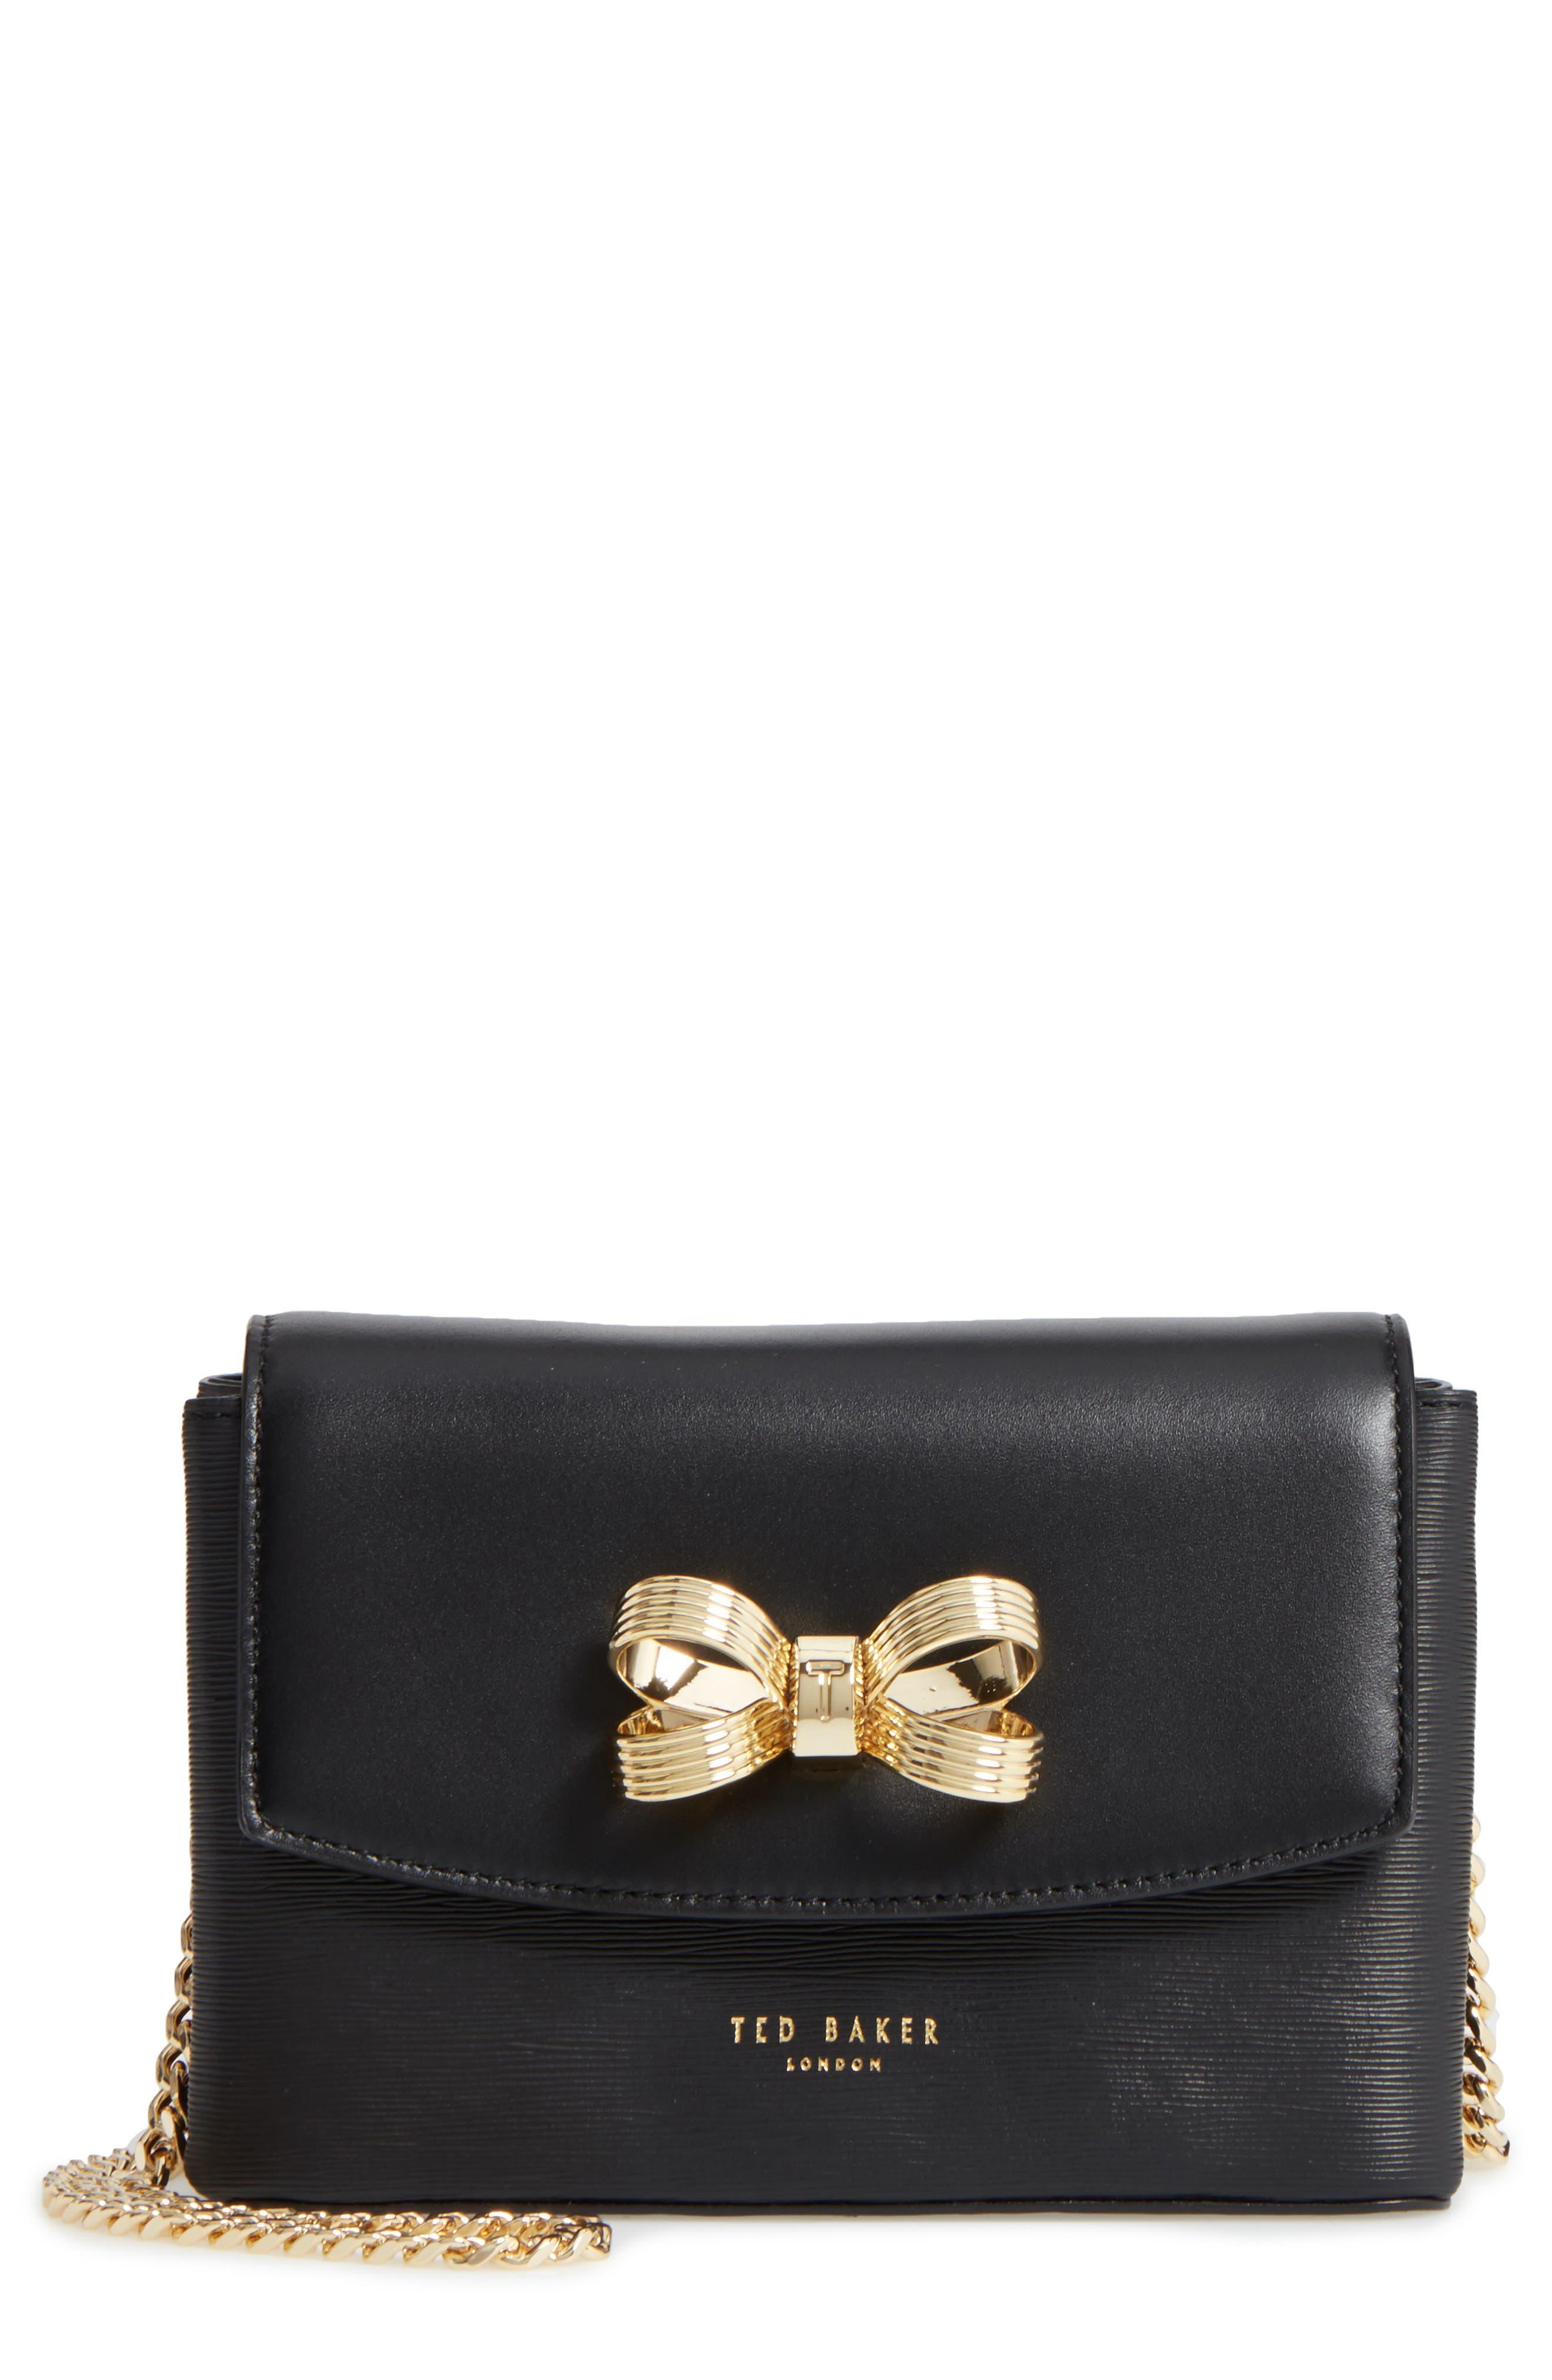 Leorr Bow Leather Crossbody Bag,                         Main,                         color, 001